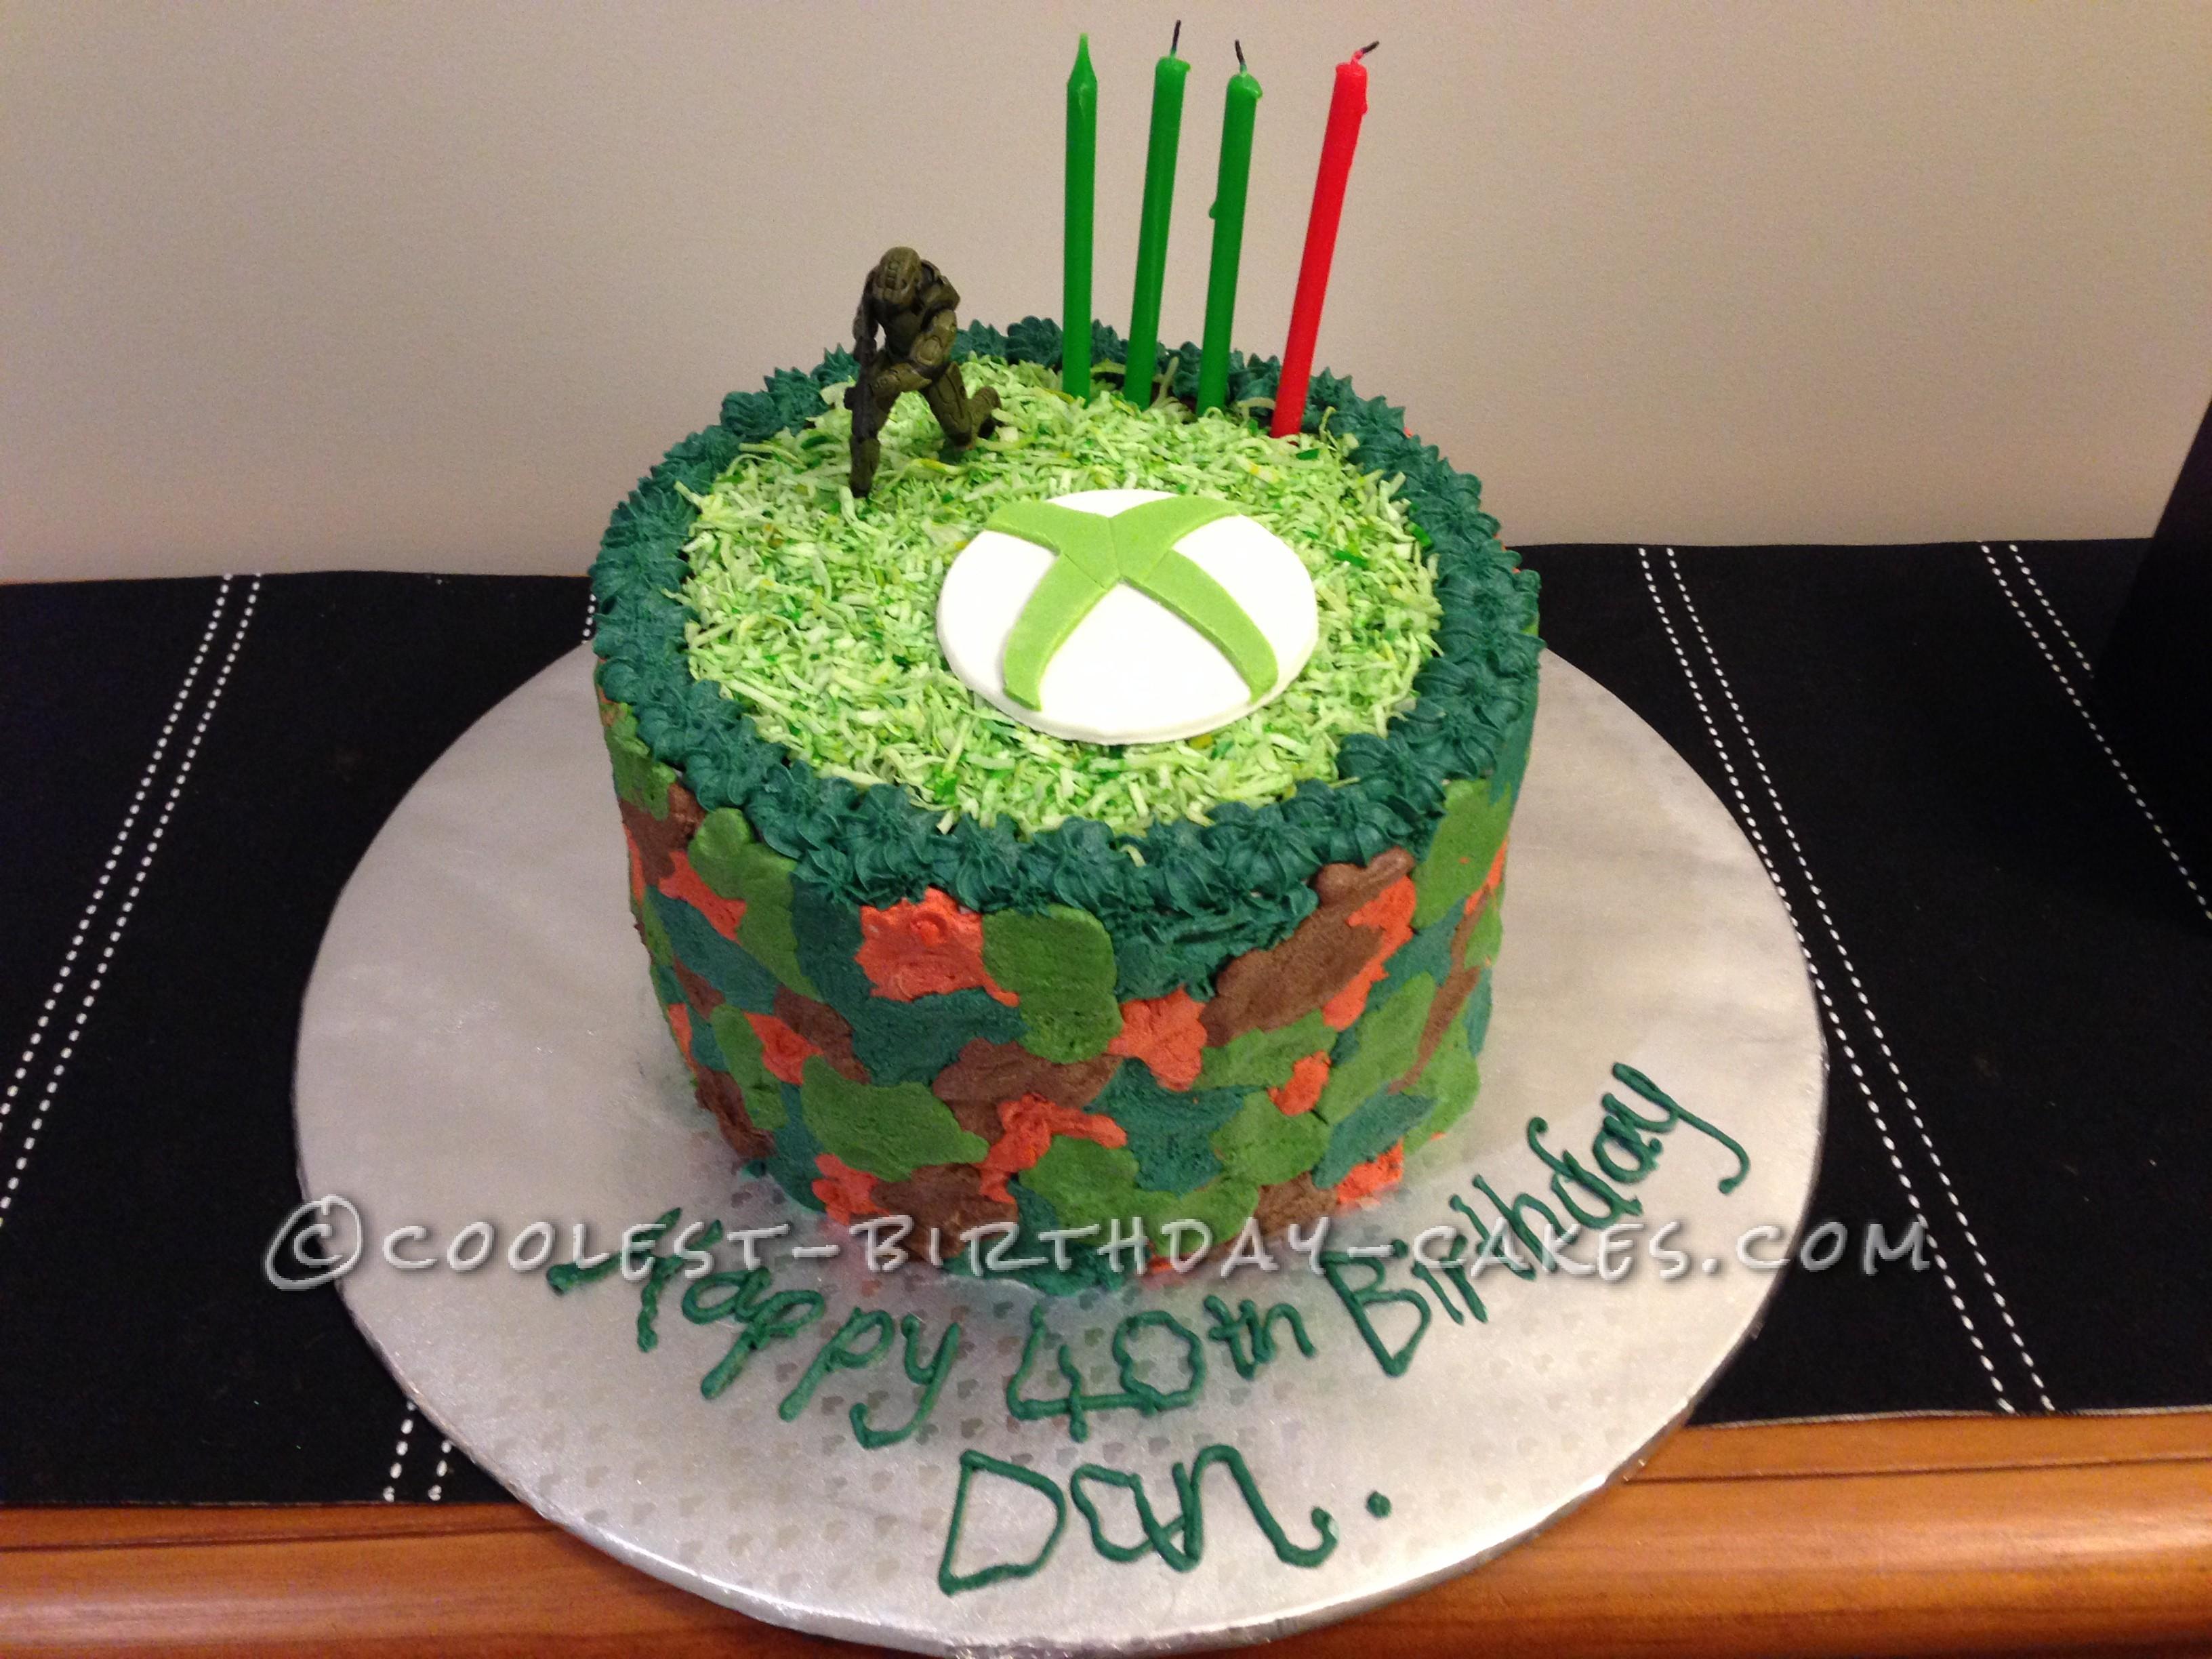 Coolest X-Box One 40th Birthday Cake